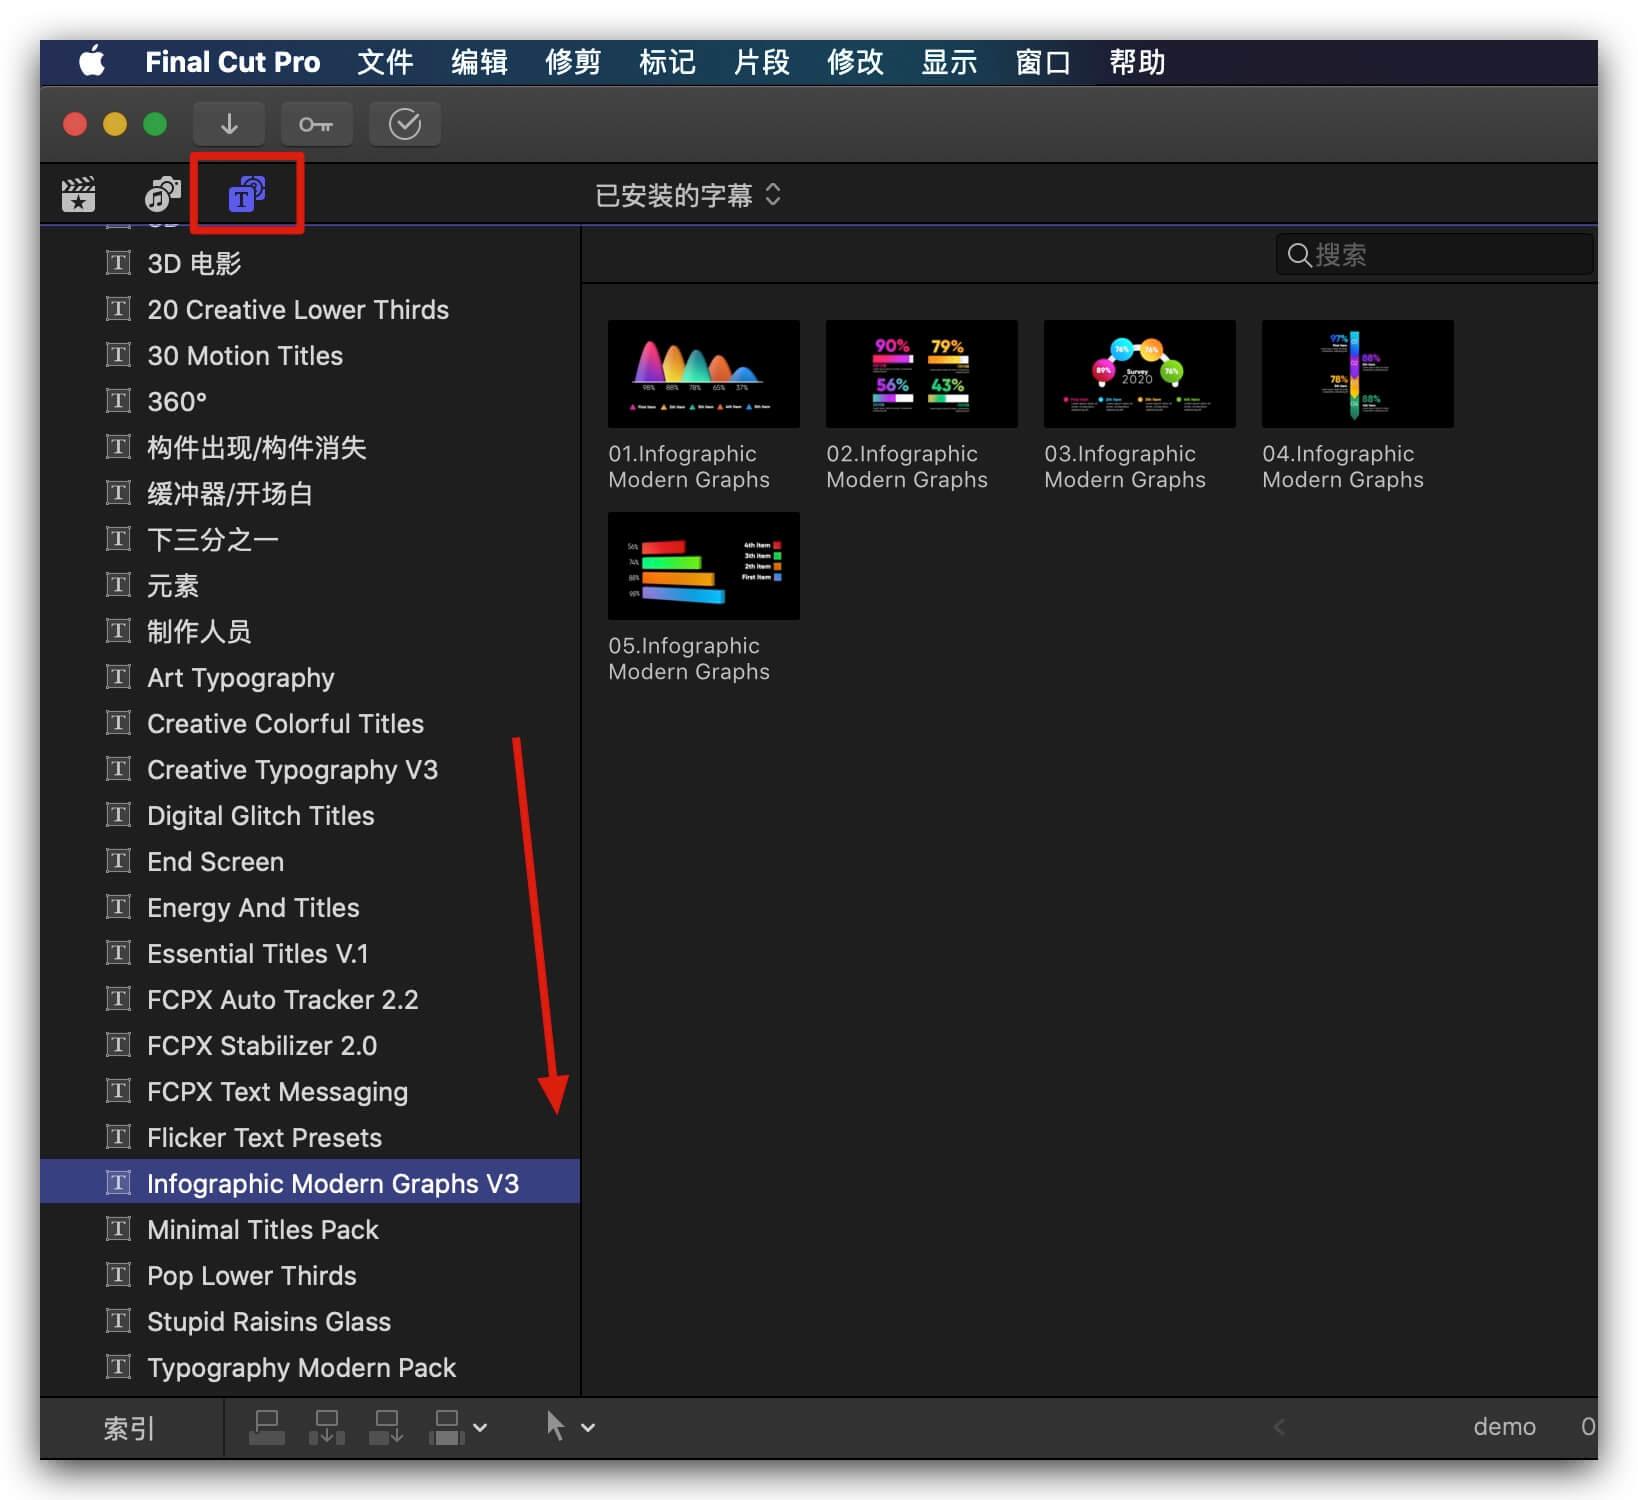 fcpx插件 信息数据图表展示预设动画 Infographic Modern Graphs V3